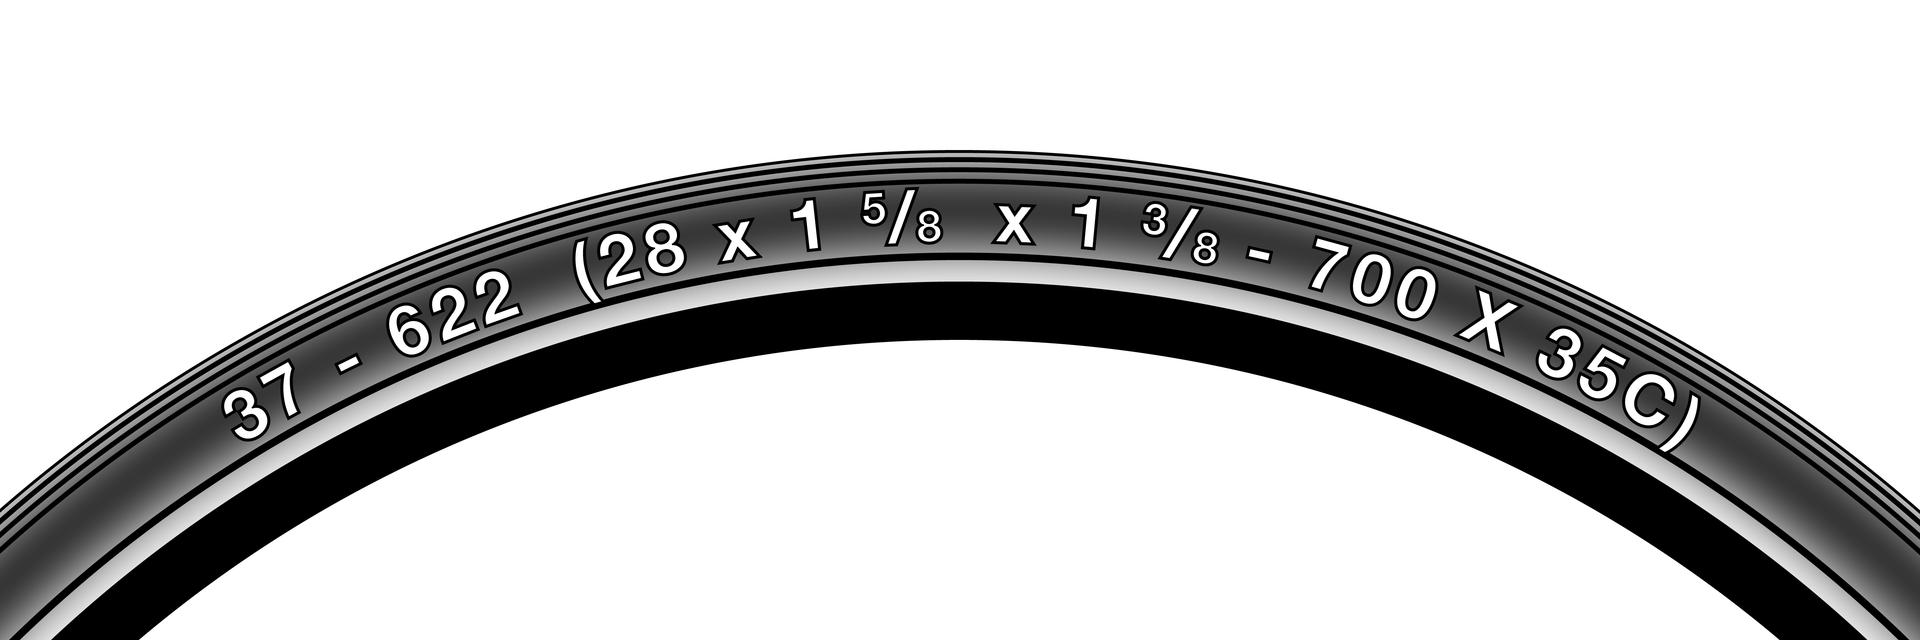 Размер покрышек (маркировка)